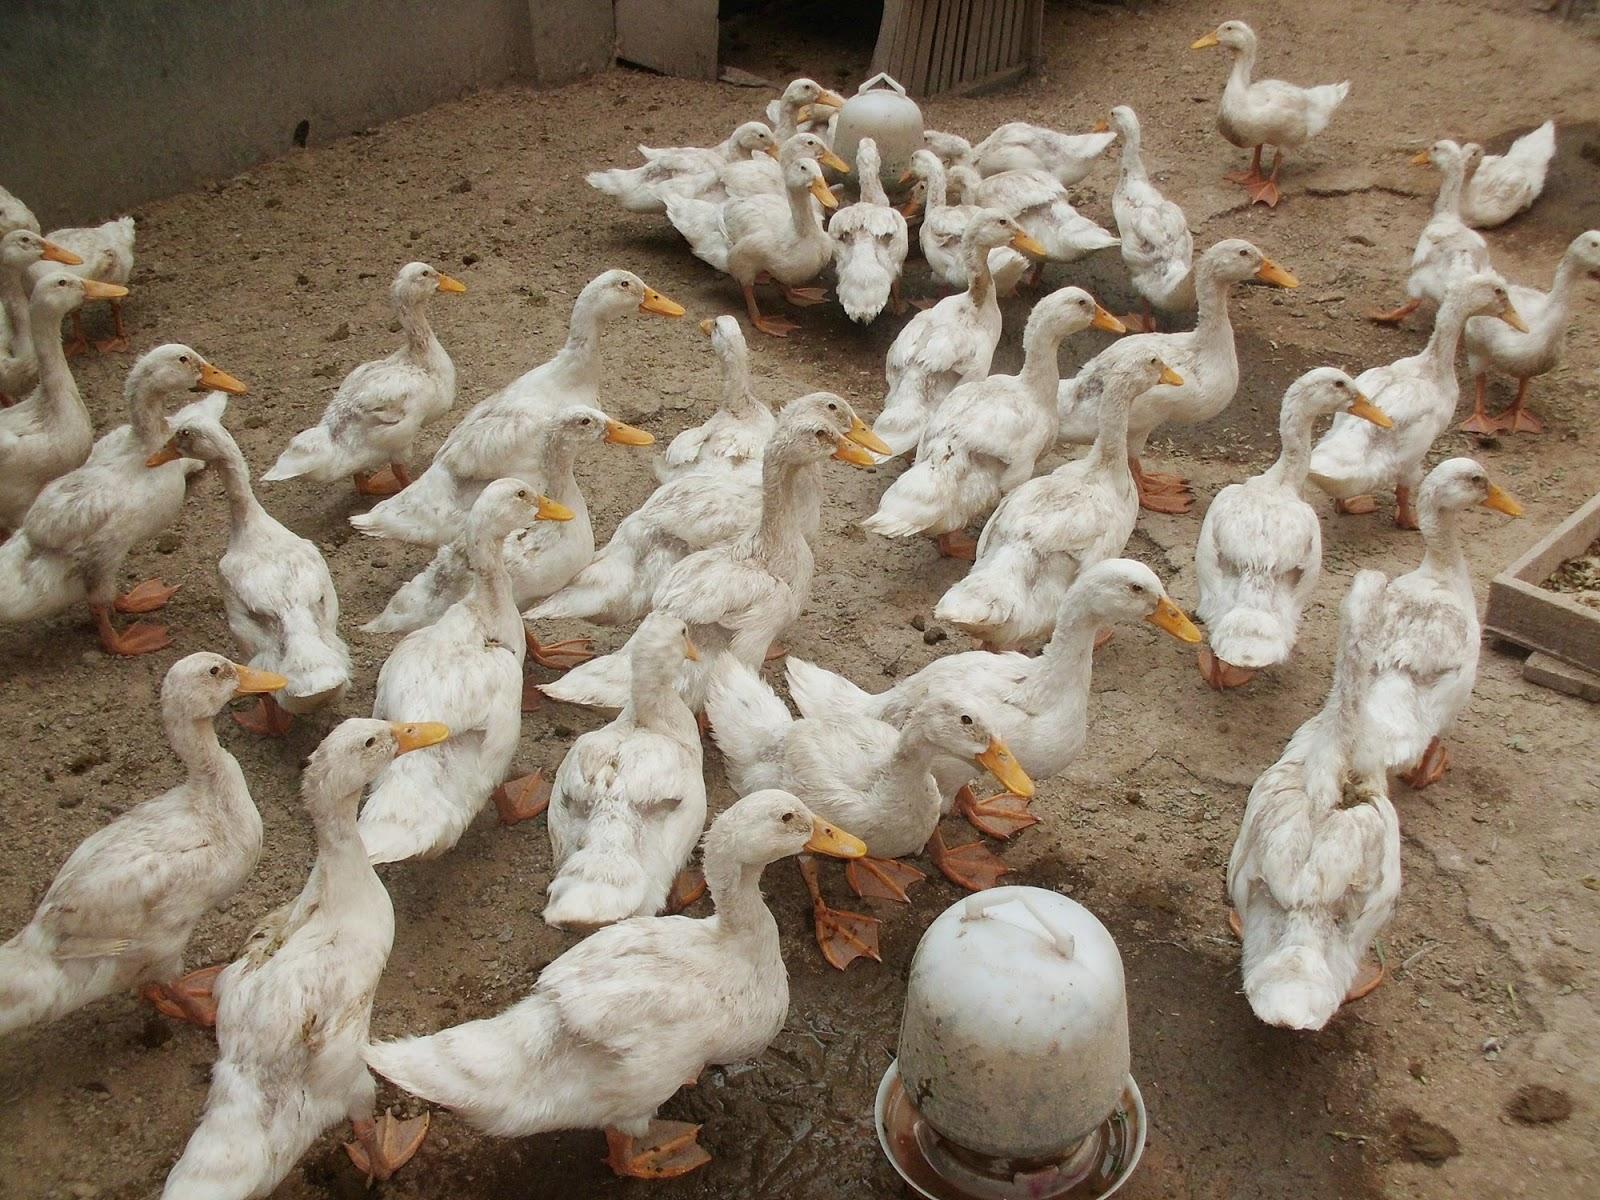 Keunggulan Lain Dari Bebek Peking Ini Adalah Selain Penghasil Pedaging Juga Dapat Menghasilakn Telur Yang Jumlah Produksinya Lebih Banyak Pada